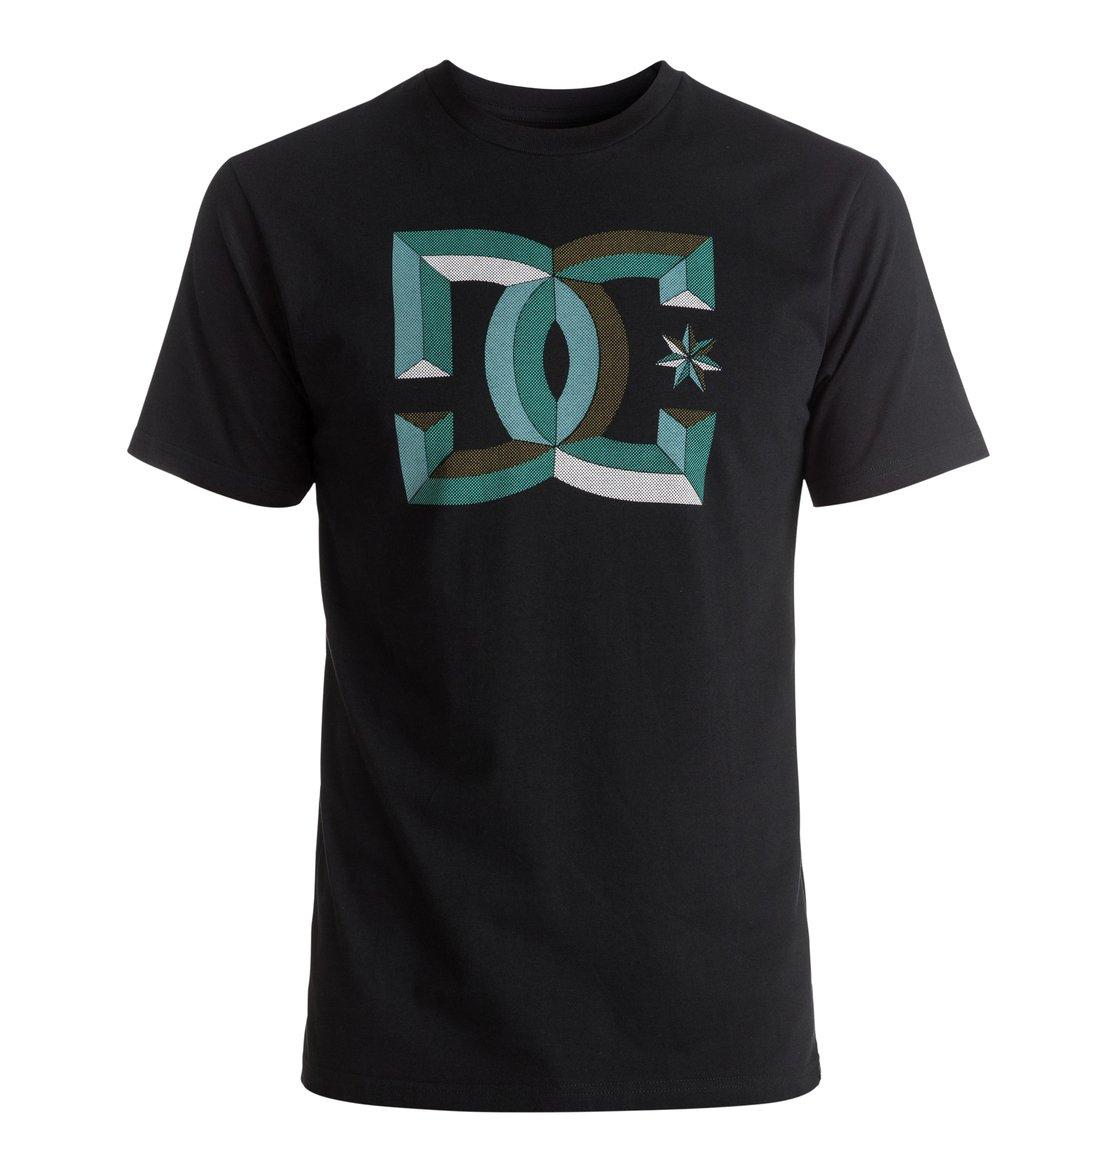 Identykit - T-Shirt